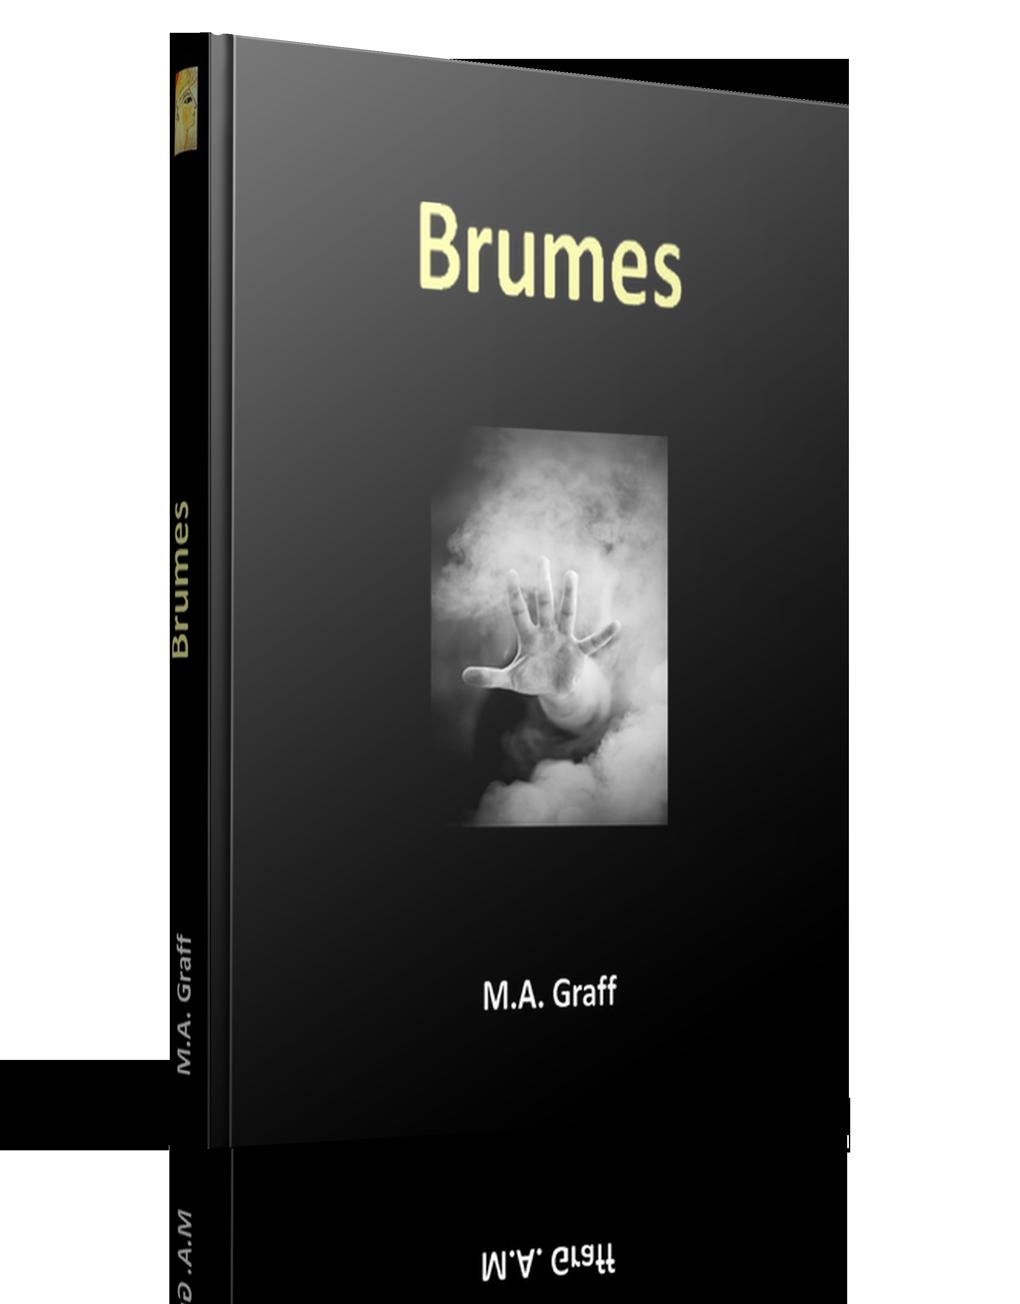 Brumes